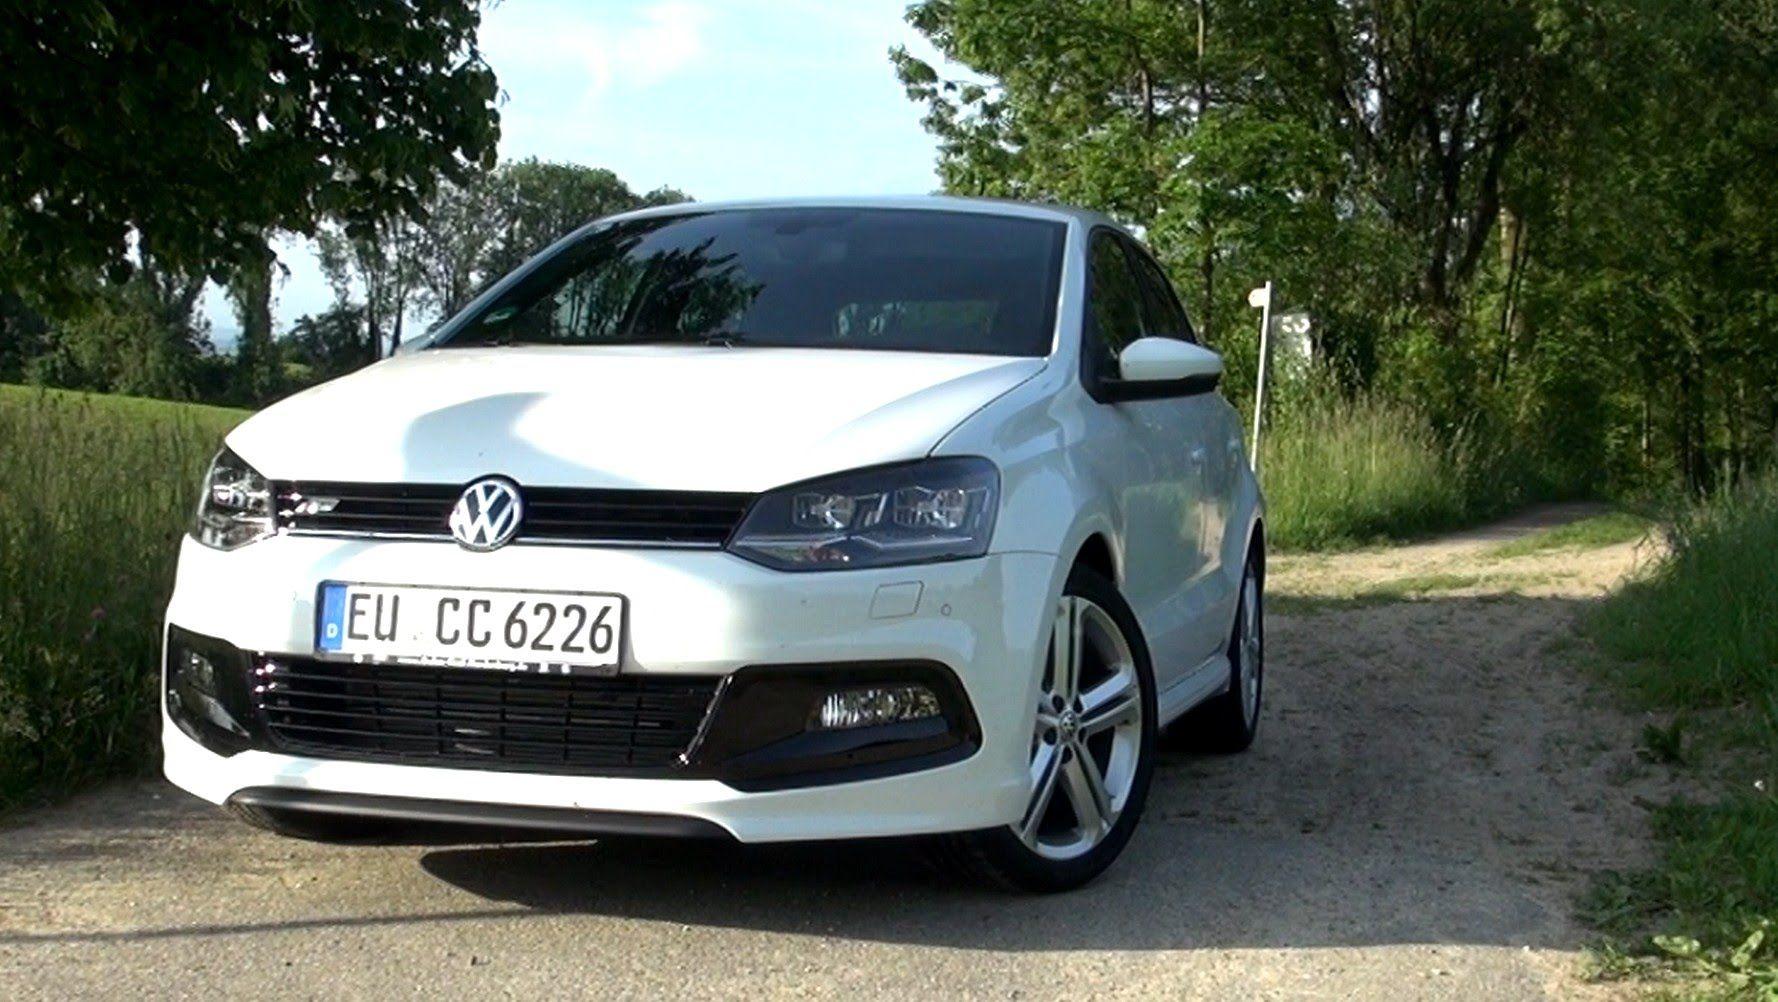 2015 Vw Polo 1 2 Tsi R Line 110 Hp Test Drive Volkswagen Polo Vw Polo Volkswagen